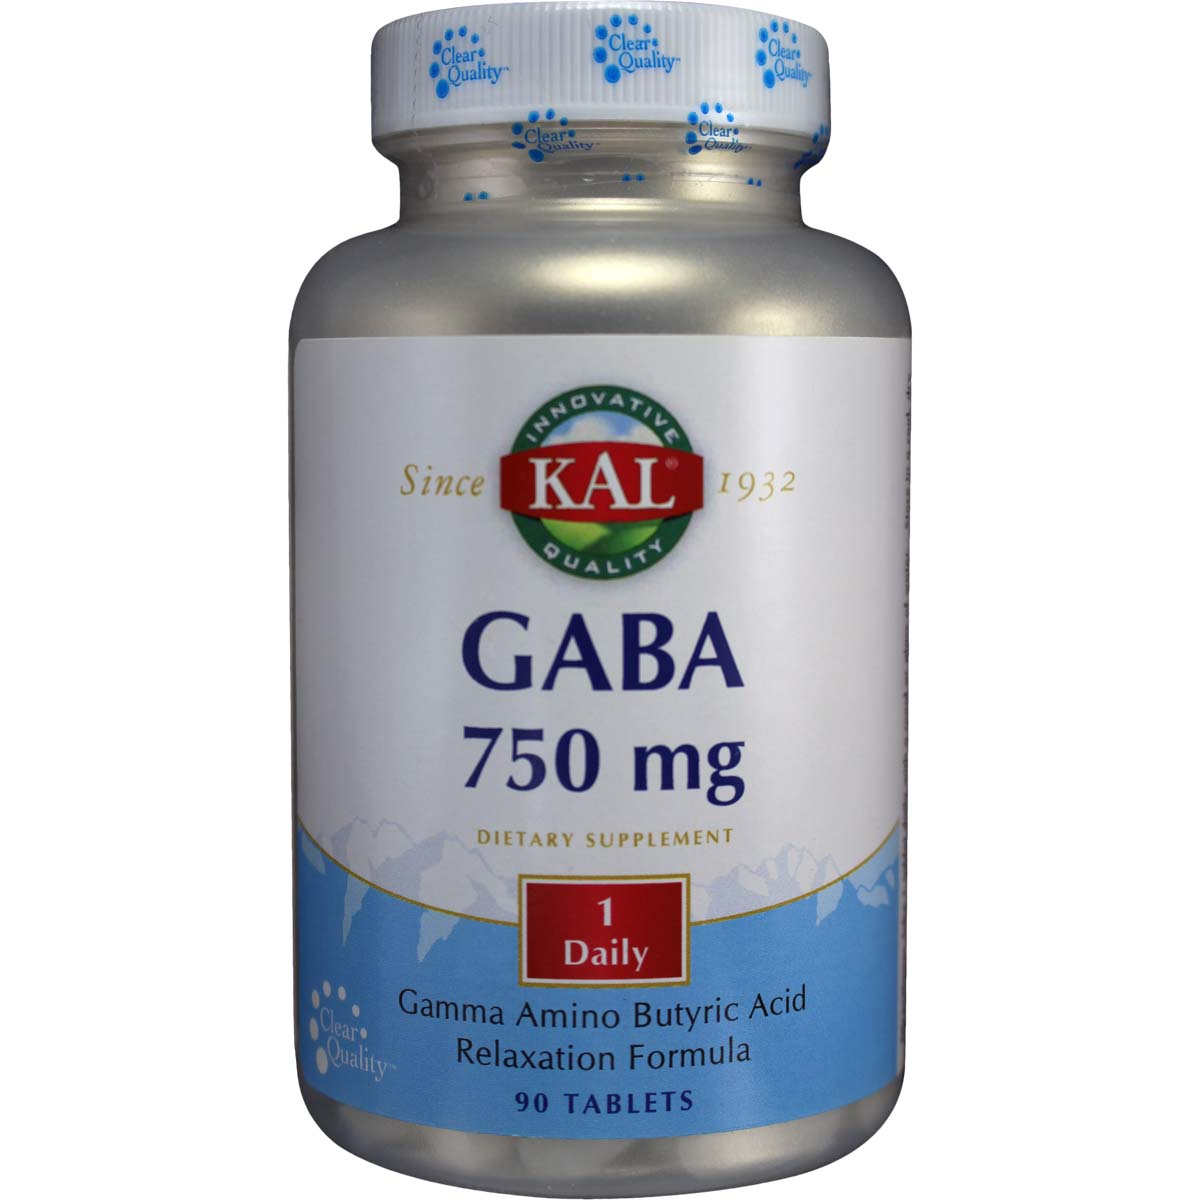 Gaba 750 Mg Gamma Amino Butyric Acid Qty 90 Tablets